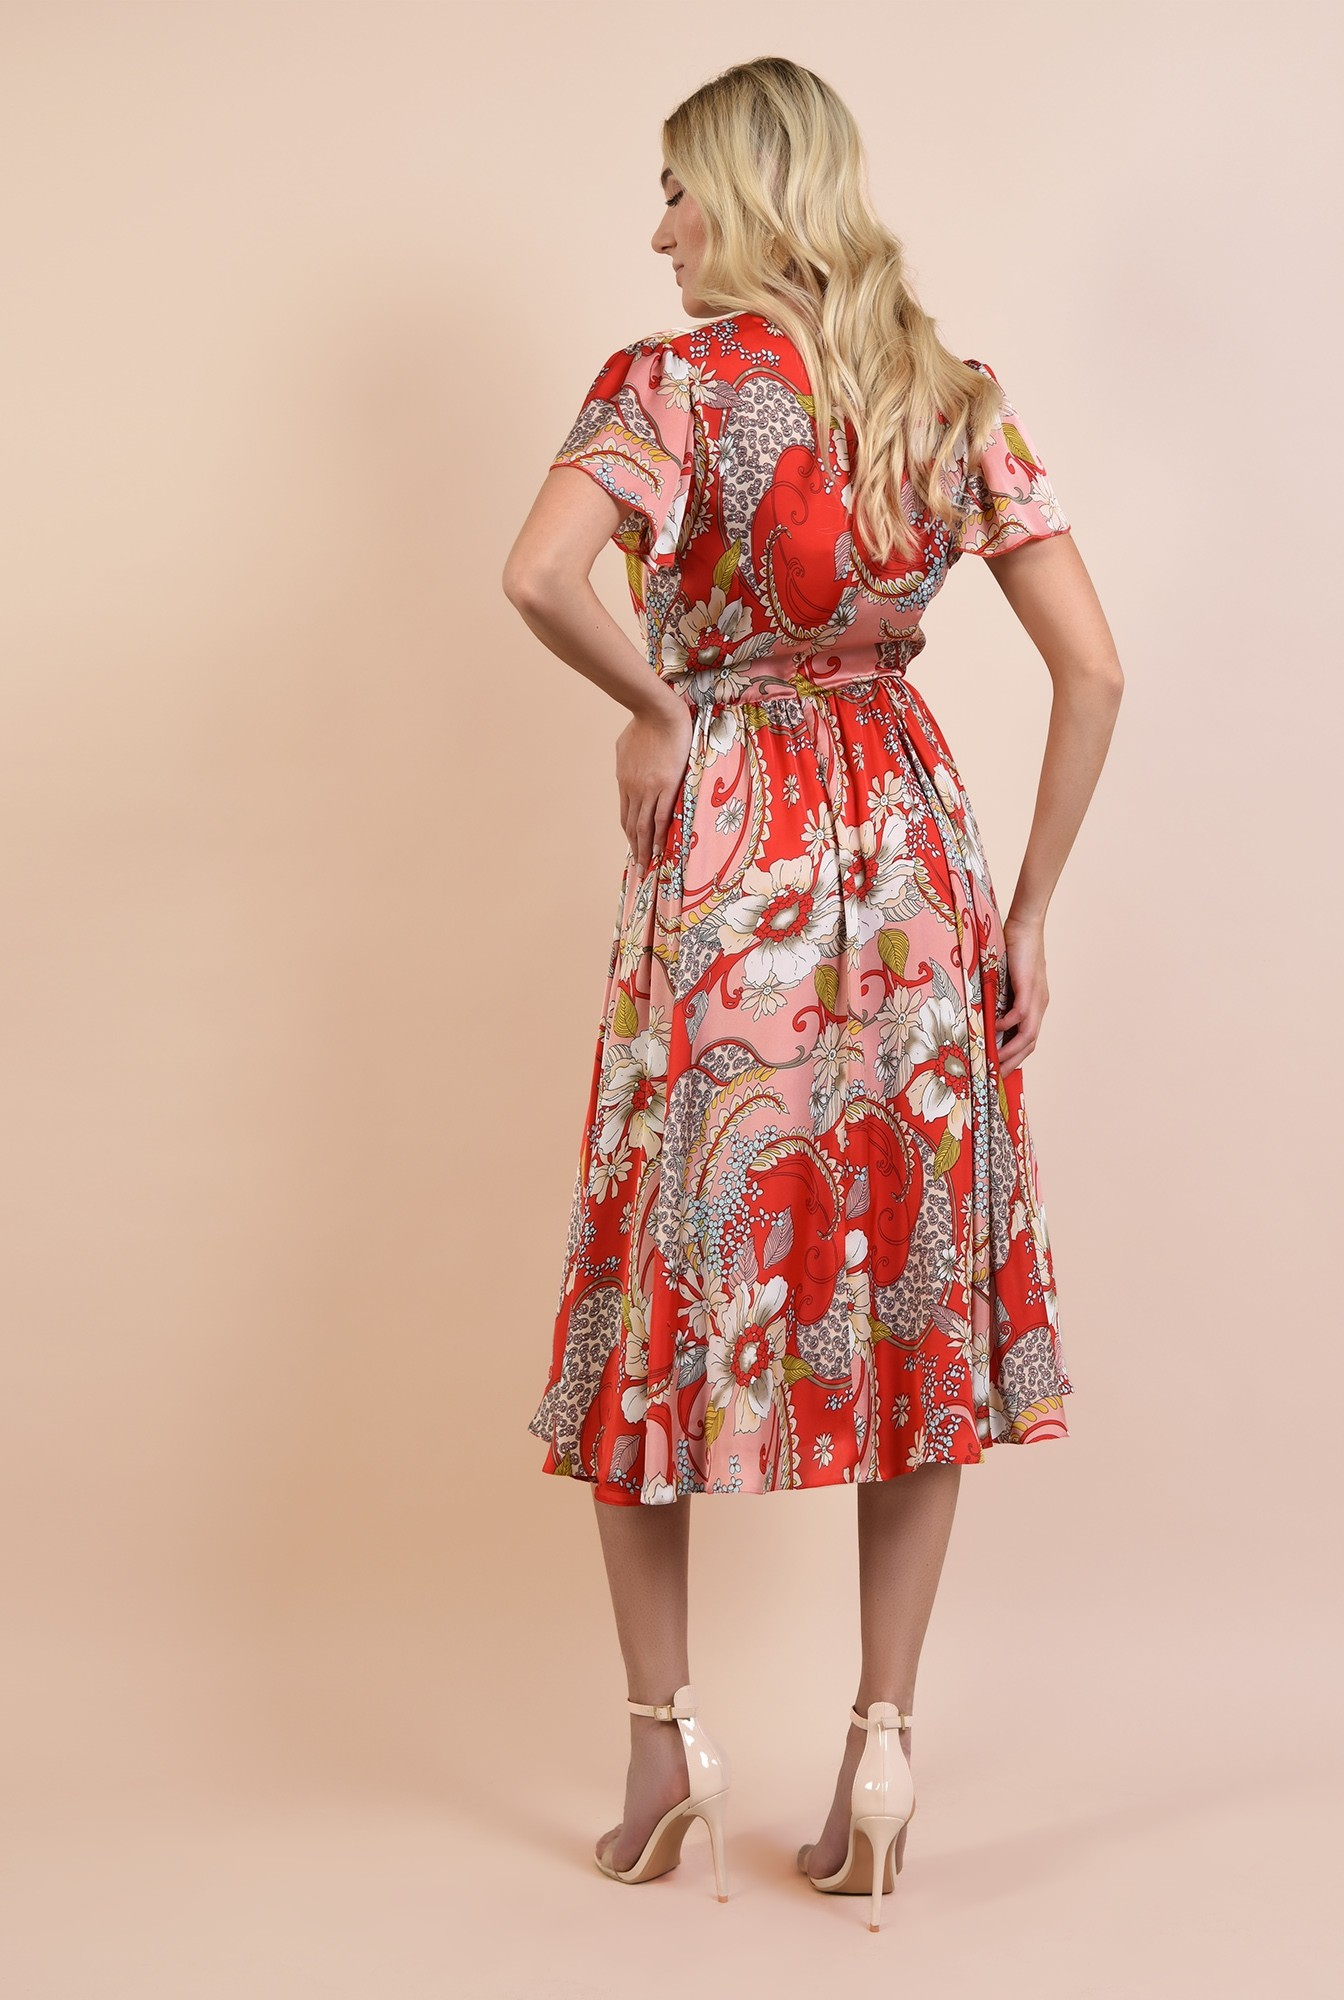 1 - rochie de seara, Poema, cu imprimeu floral, cu maneci fluture, clos